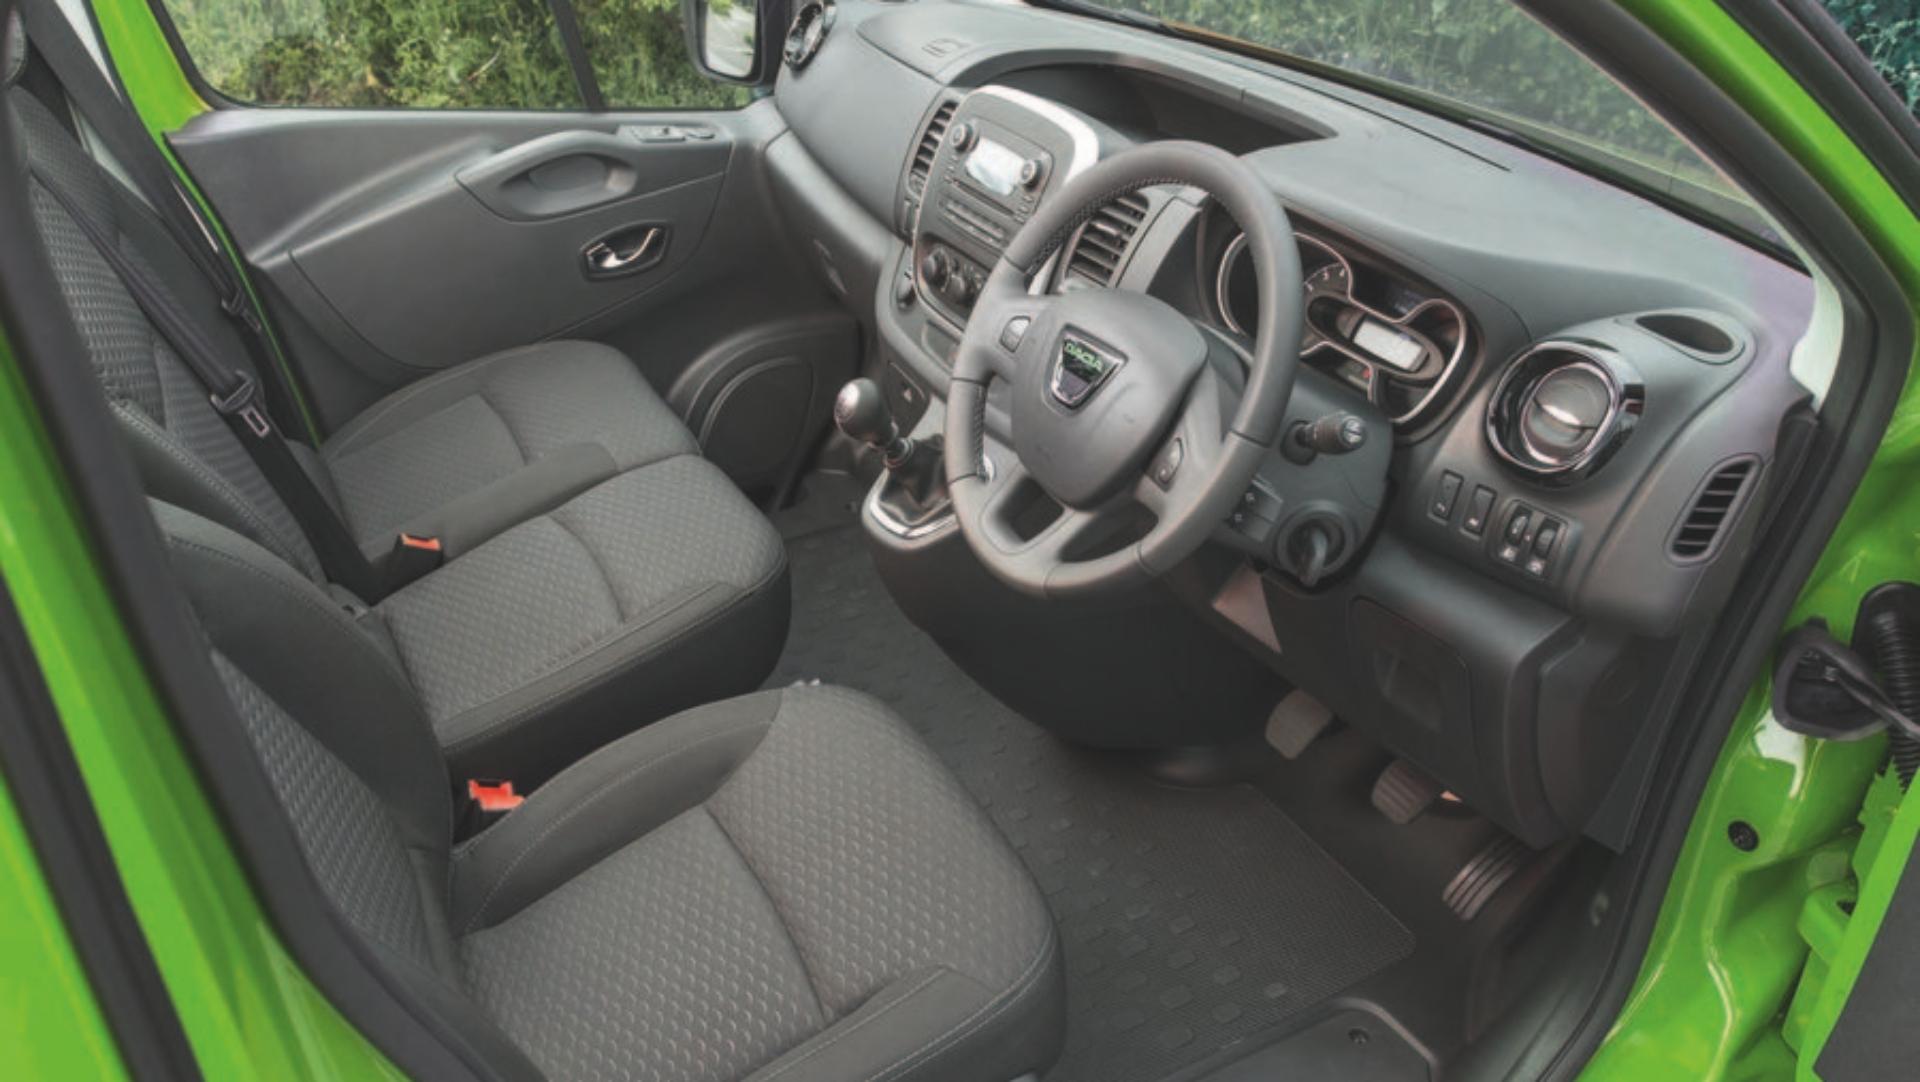 Dacia Sandman van — randare Autocar